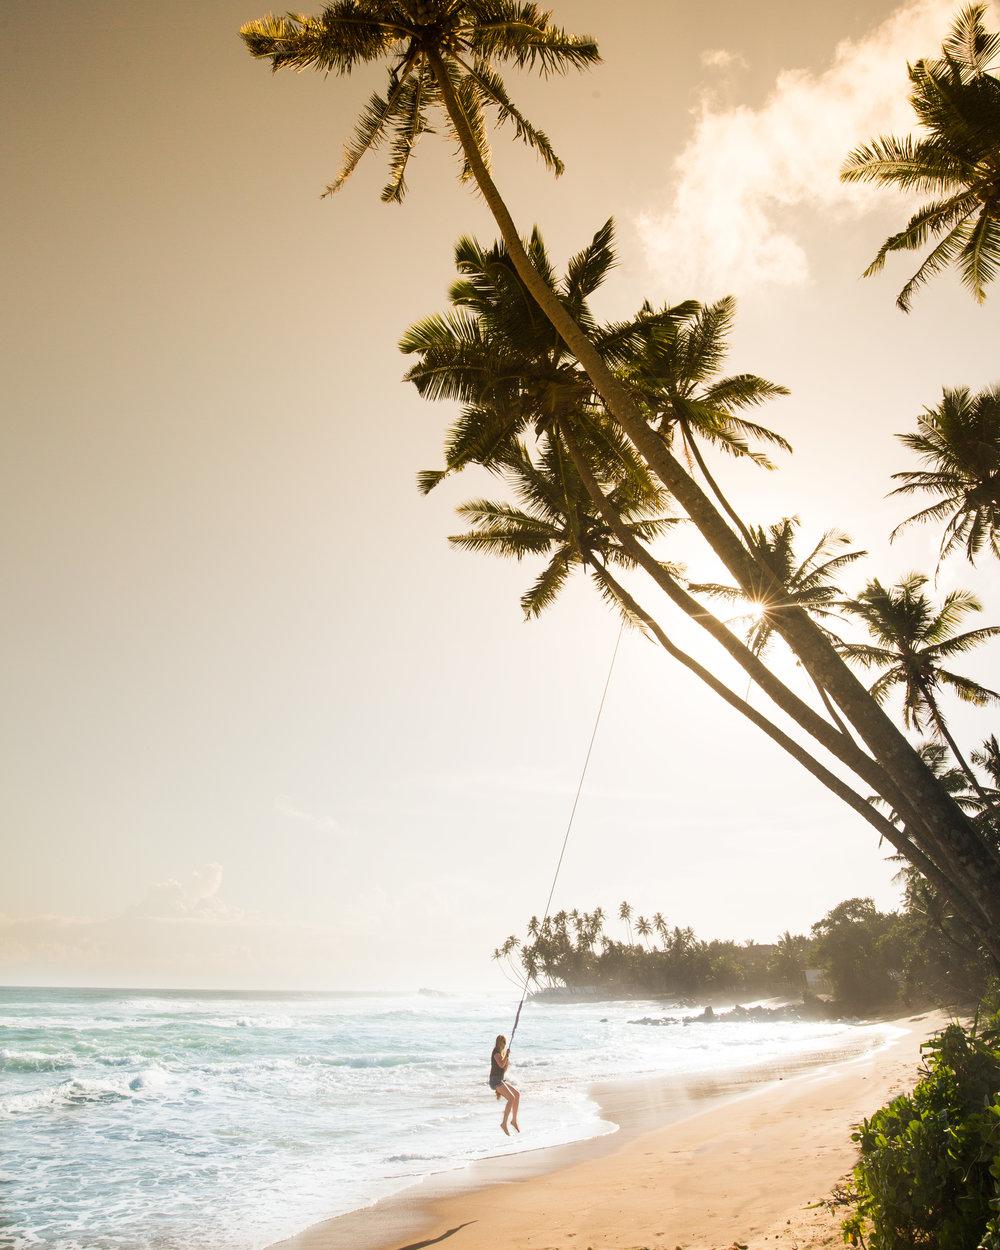 Best time to visit Sri Lanka - Cheaper in June